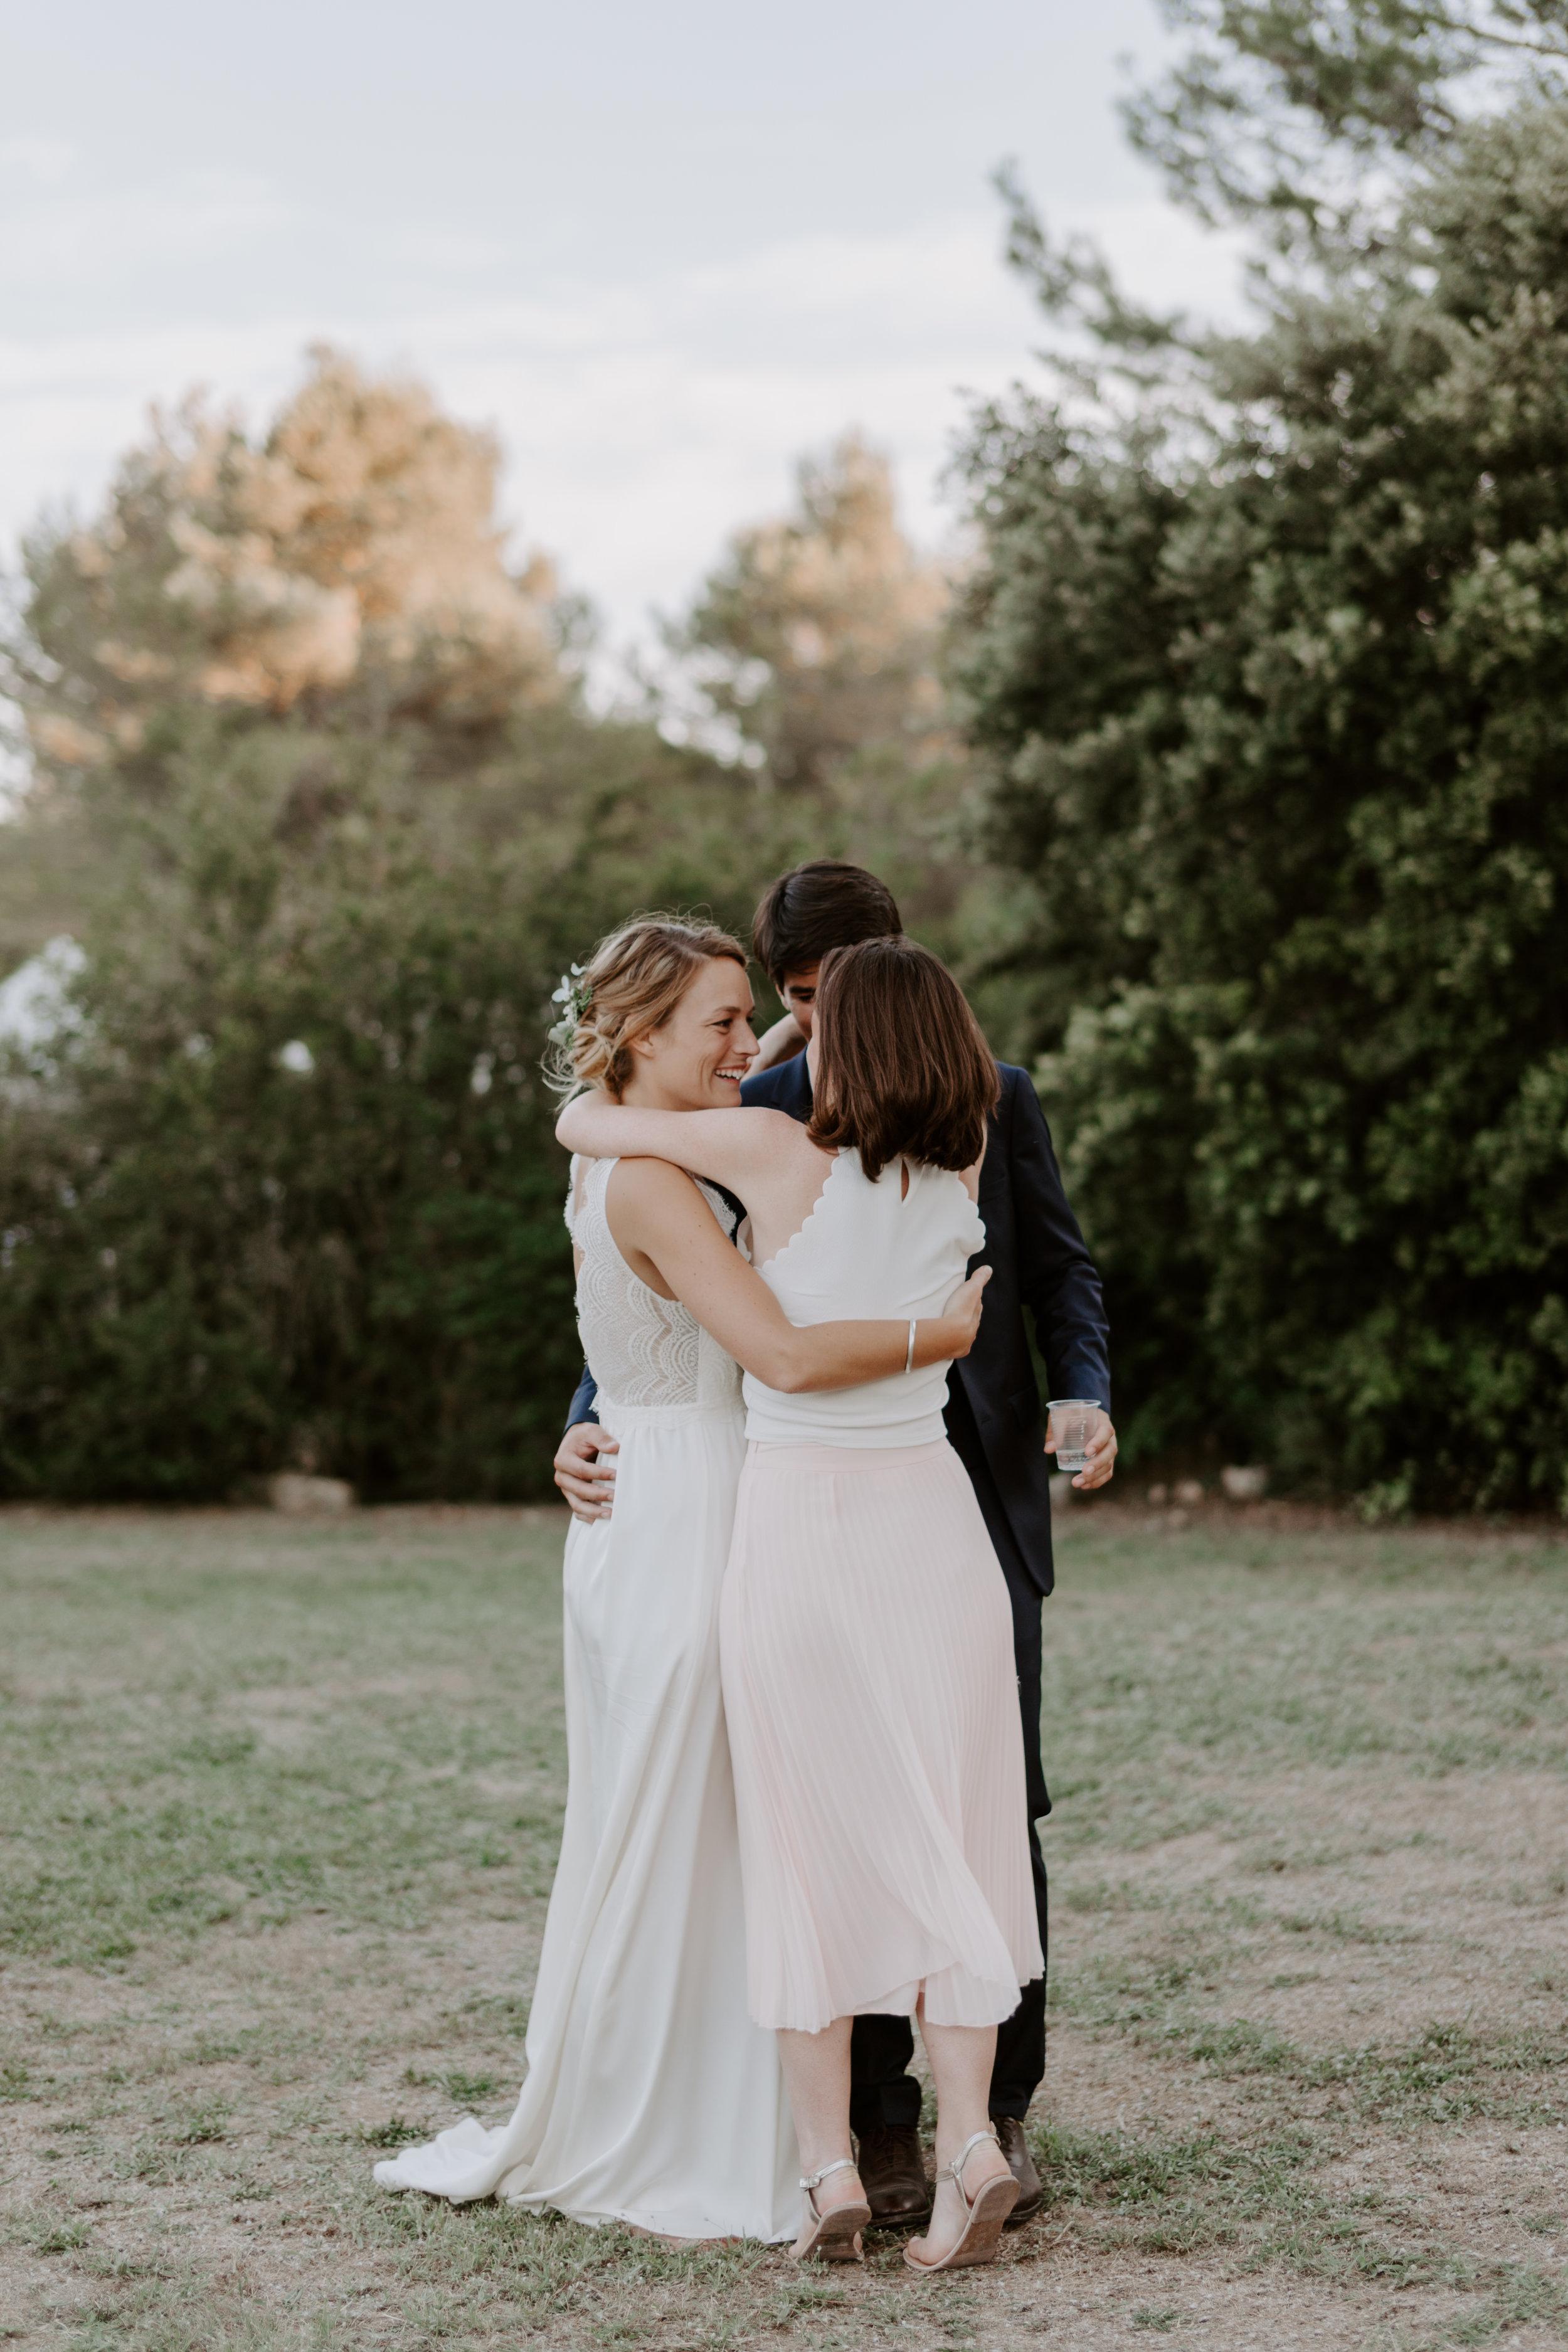 elsacaza_photographe_mariage_Juliette_Nicolas-577.jpg